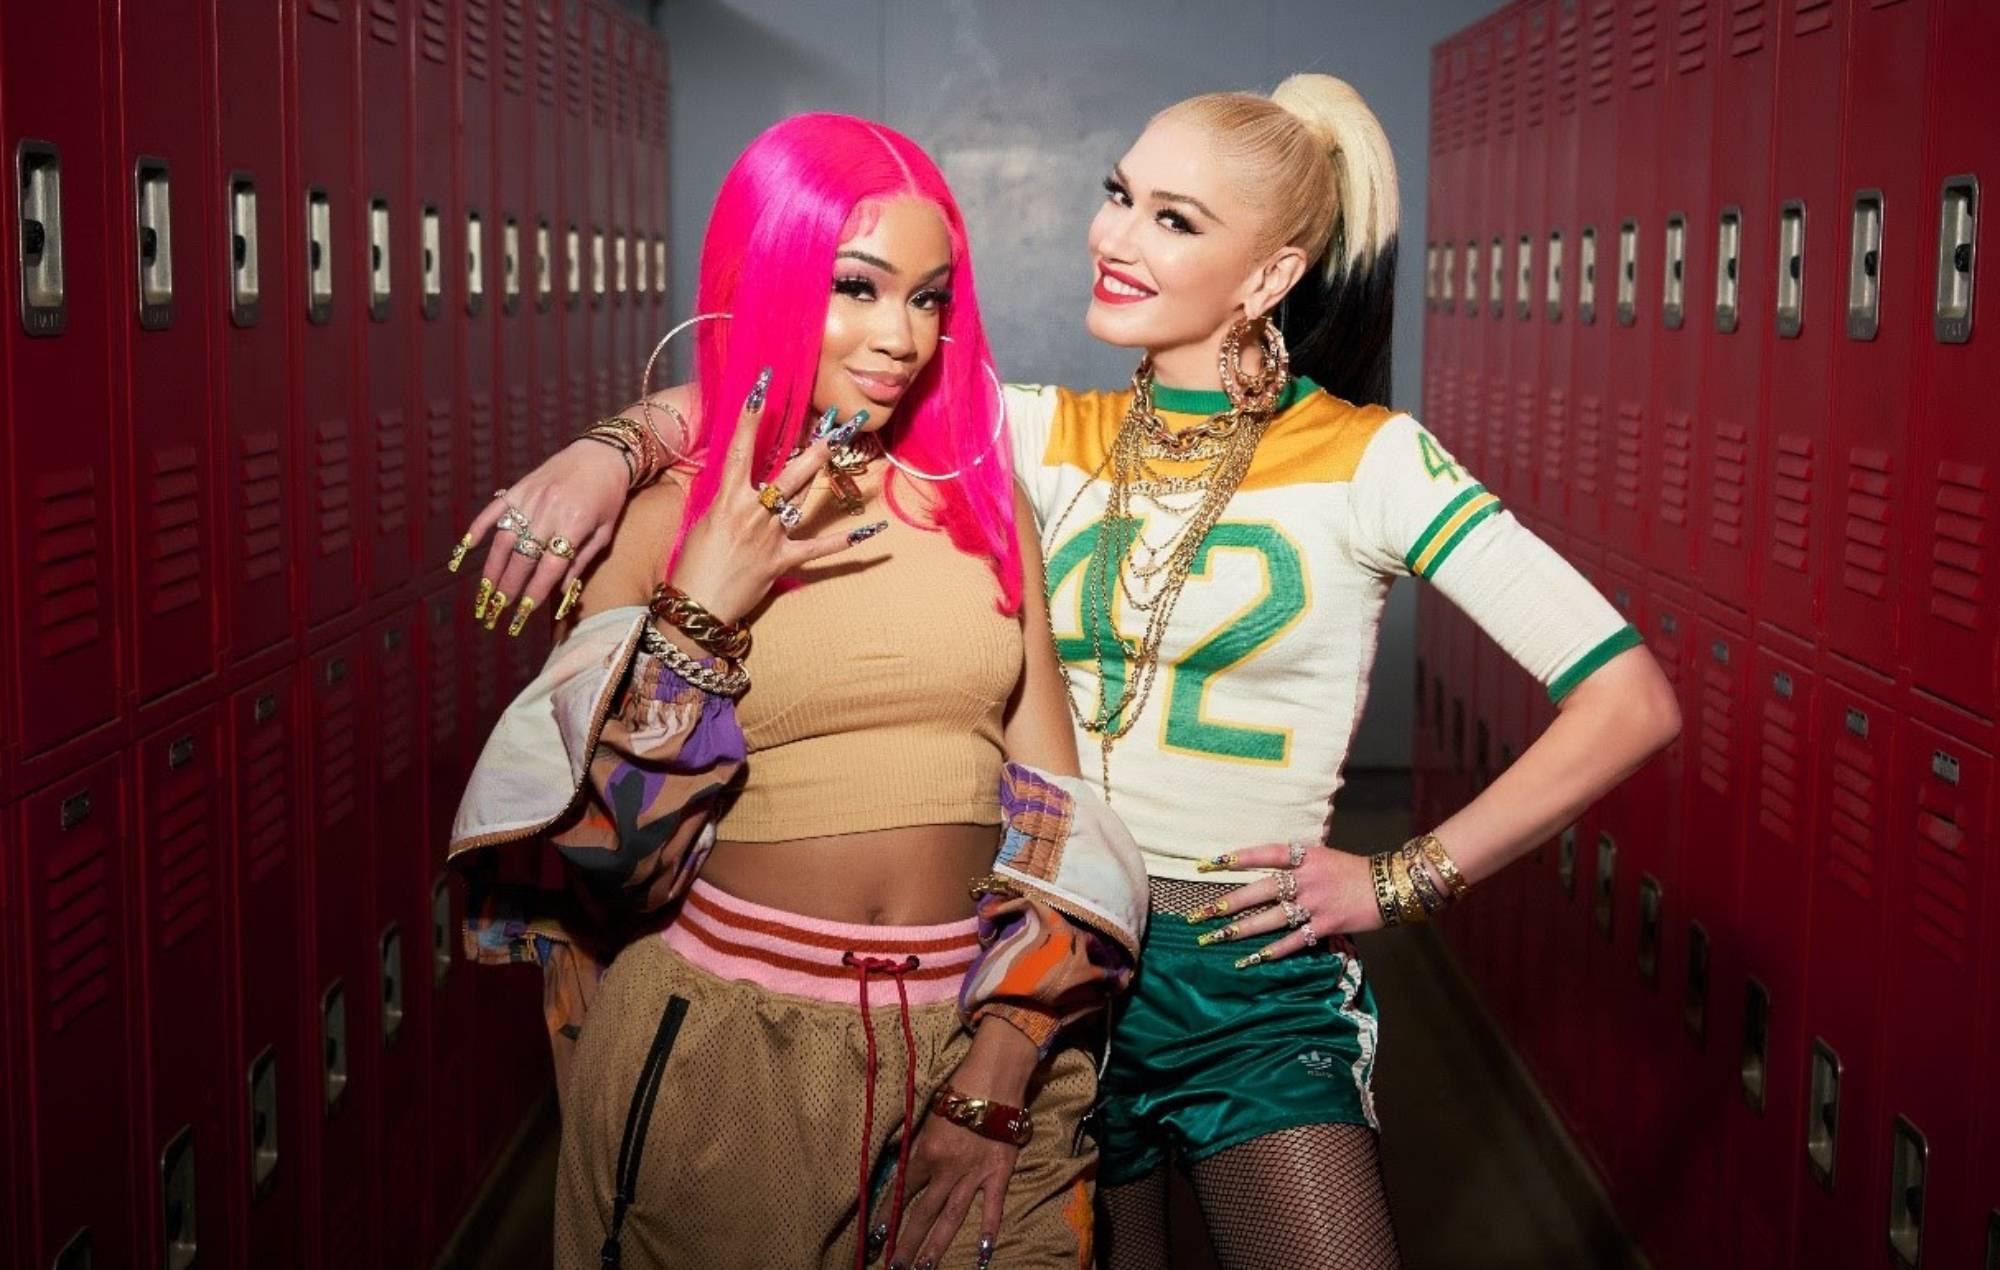 Listen to Gwen Stefani and Saweetie team up on 'Slow Clap'